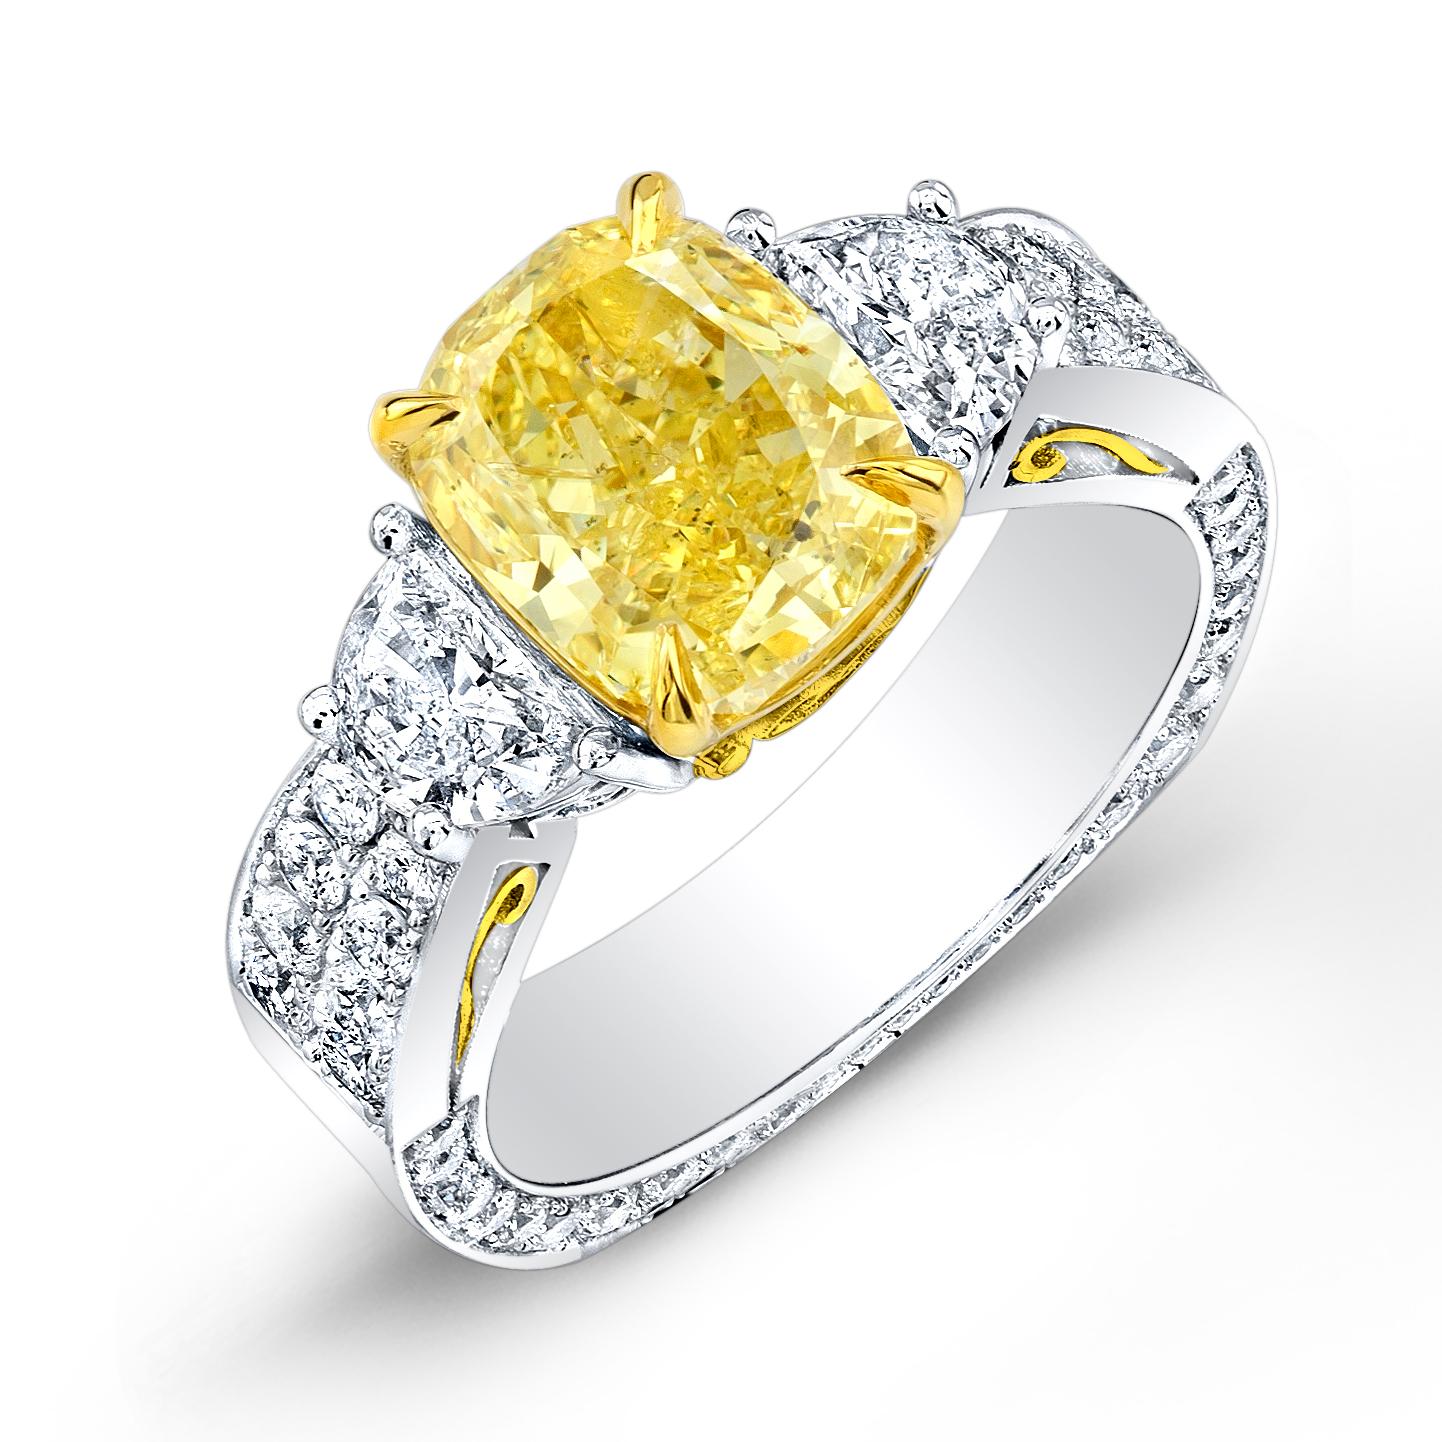 3 Stone Half Moon Pave Euro Shank Diamond Ring